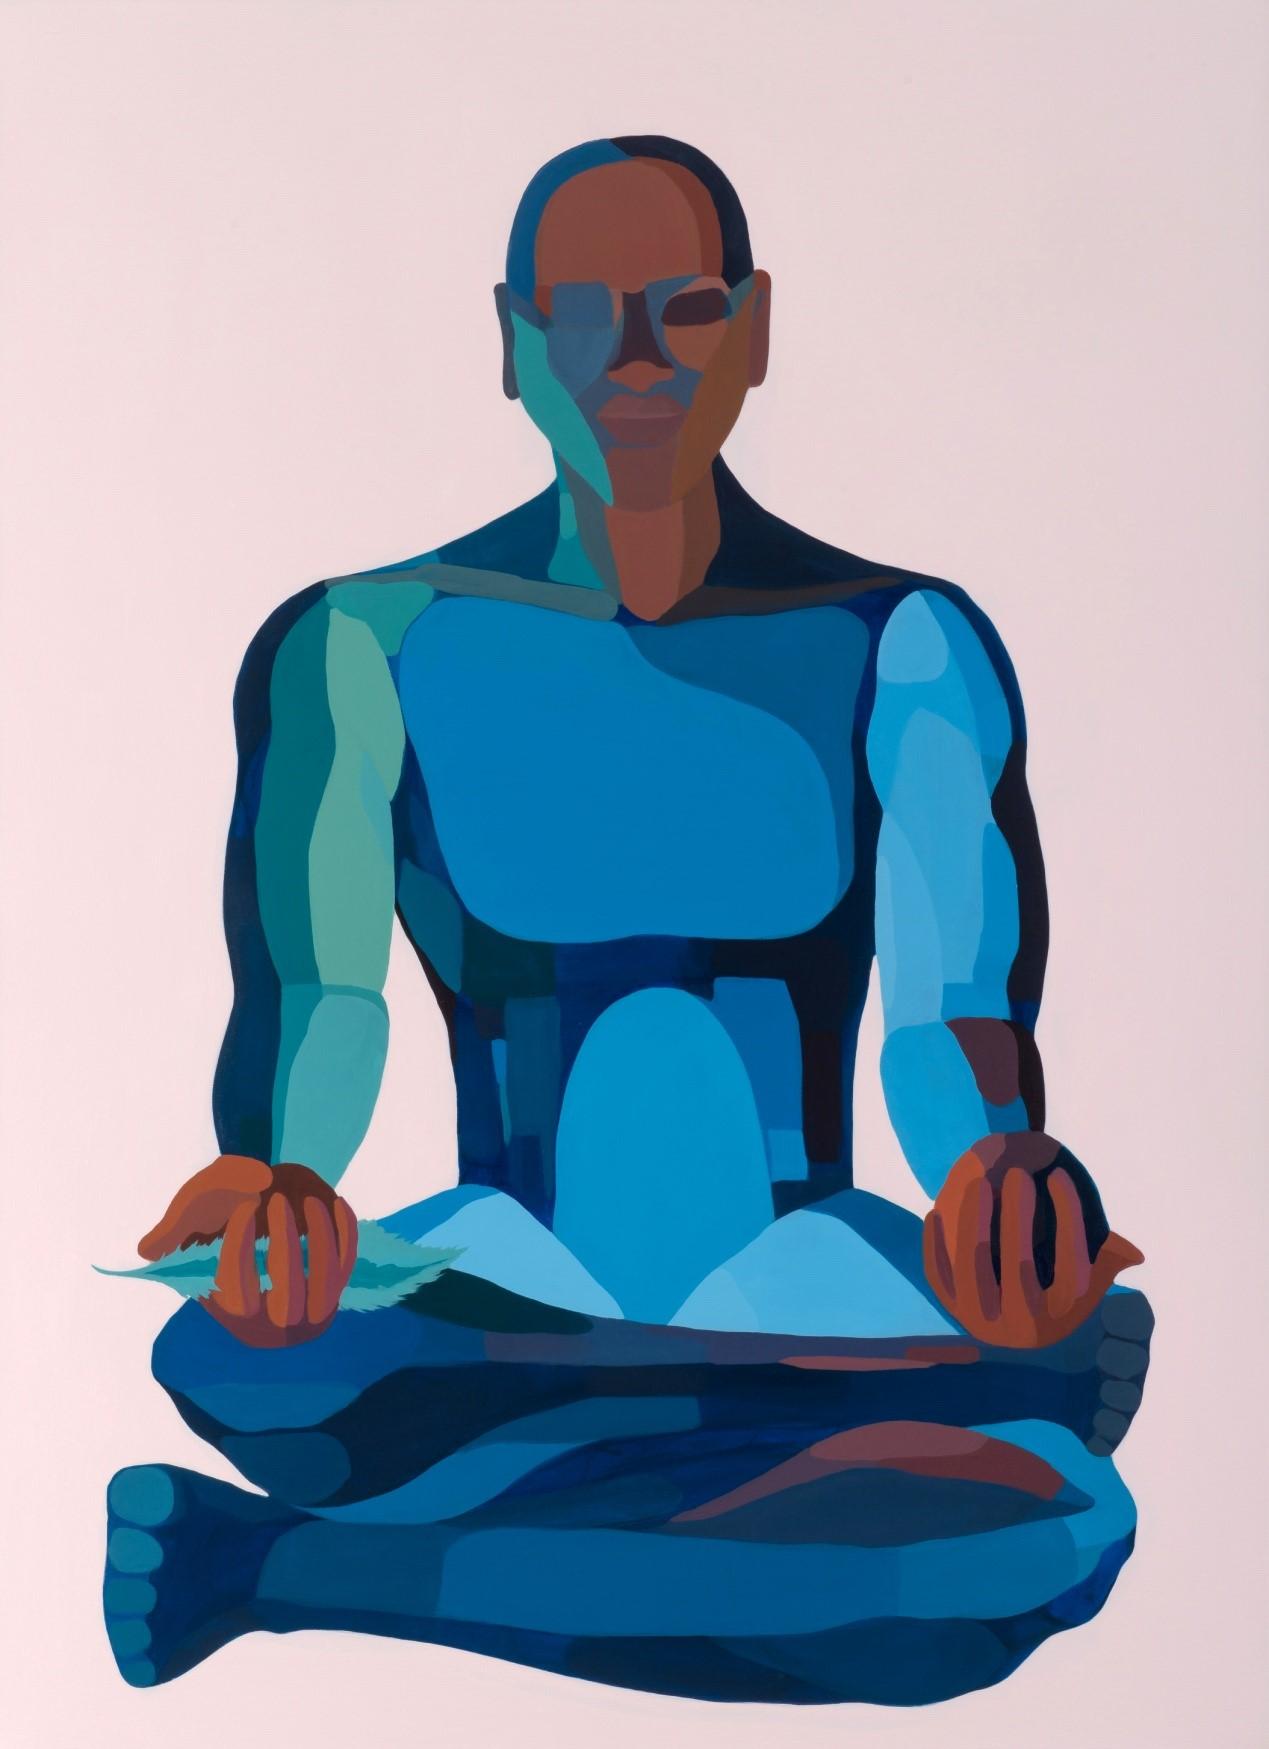 Nirit Takele, Scale, 110x80 cm, acrylic on canvas, 2017